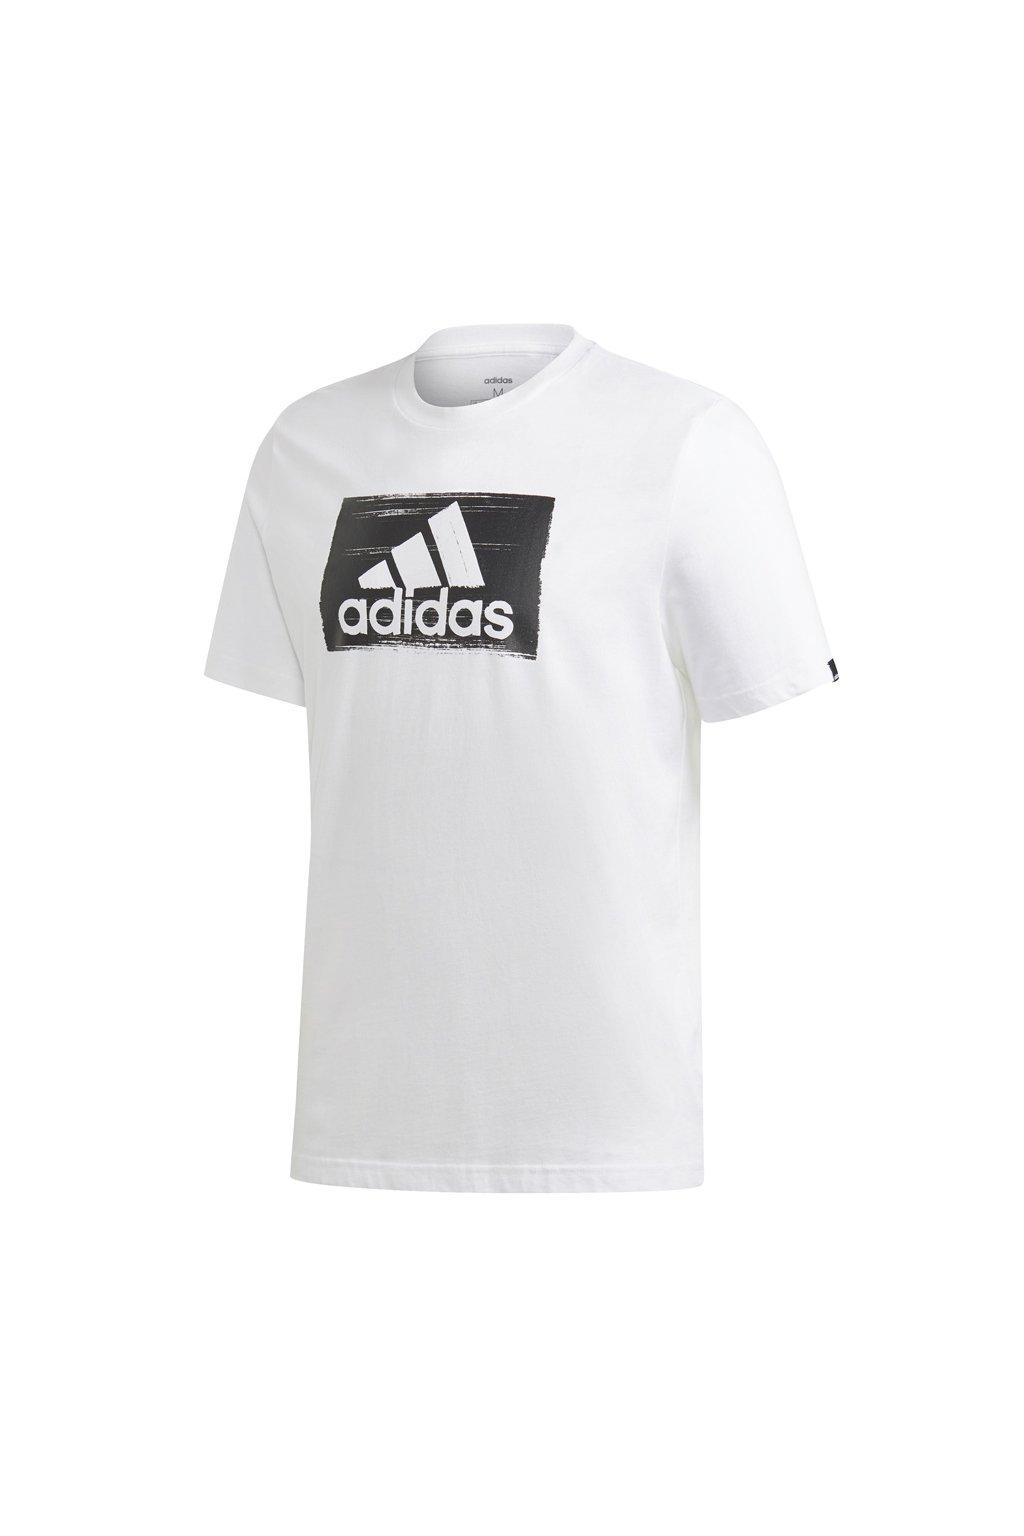 Pánske tričko Adidas M Brshstrk Tee biela GD5894